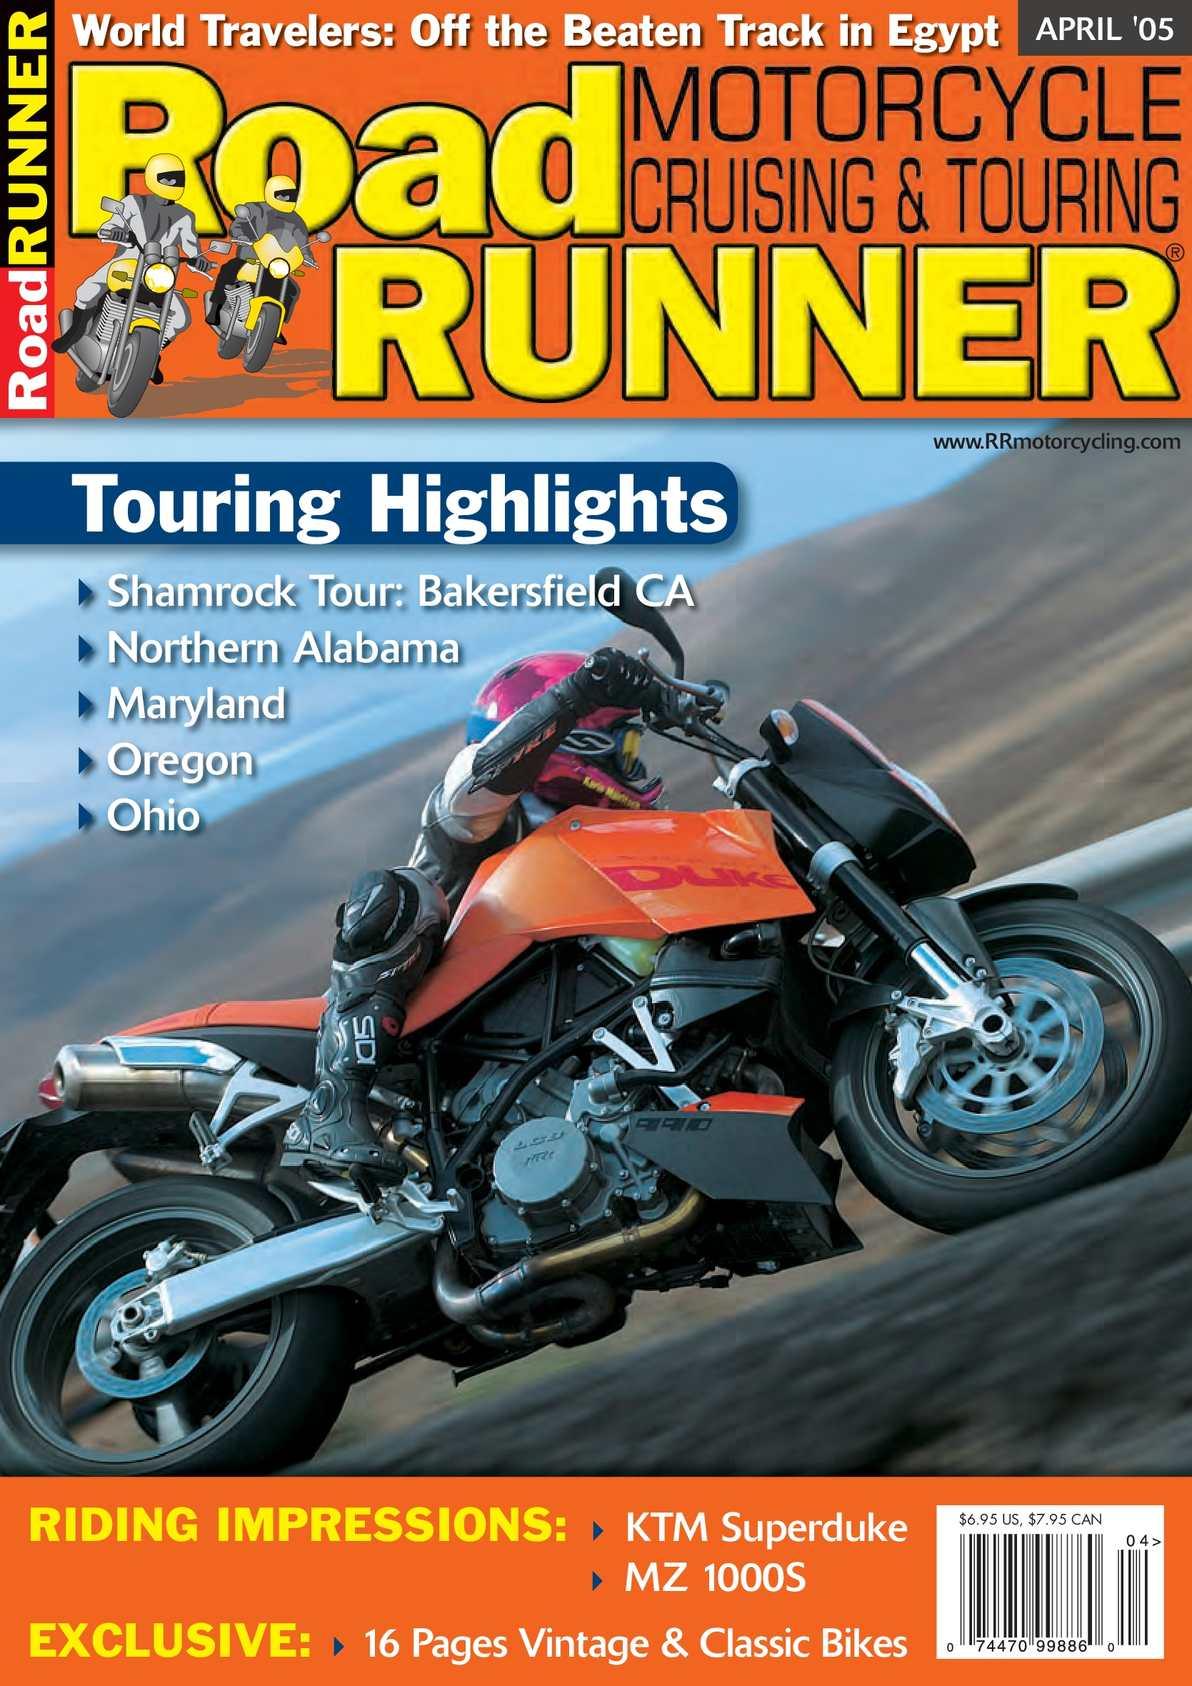 Calamo Roadrunner Magazine March April 2005 Royal Enfield Bullet 350 500cc Usa Spec Colour Wiring Diagram